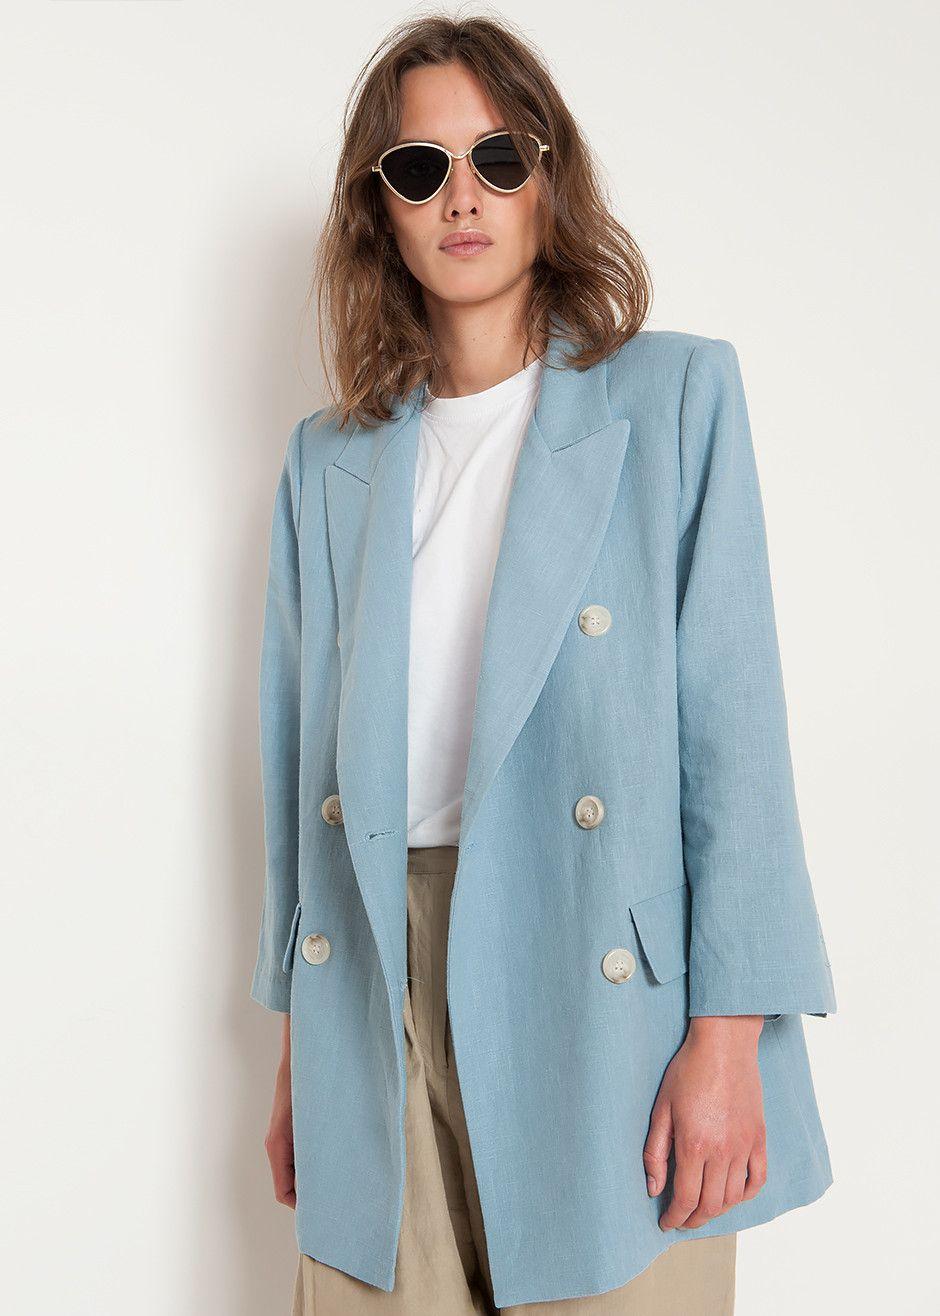 Fatale Tappeto triplicare  Light Blue Linen Blazer – The Frankie Shop | Blazer outfits for women,  Textiles fashion, Fashion